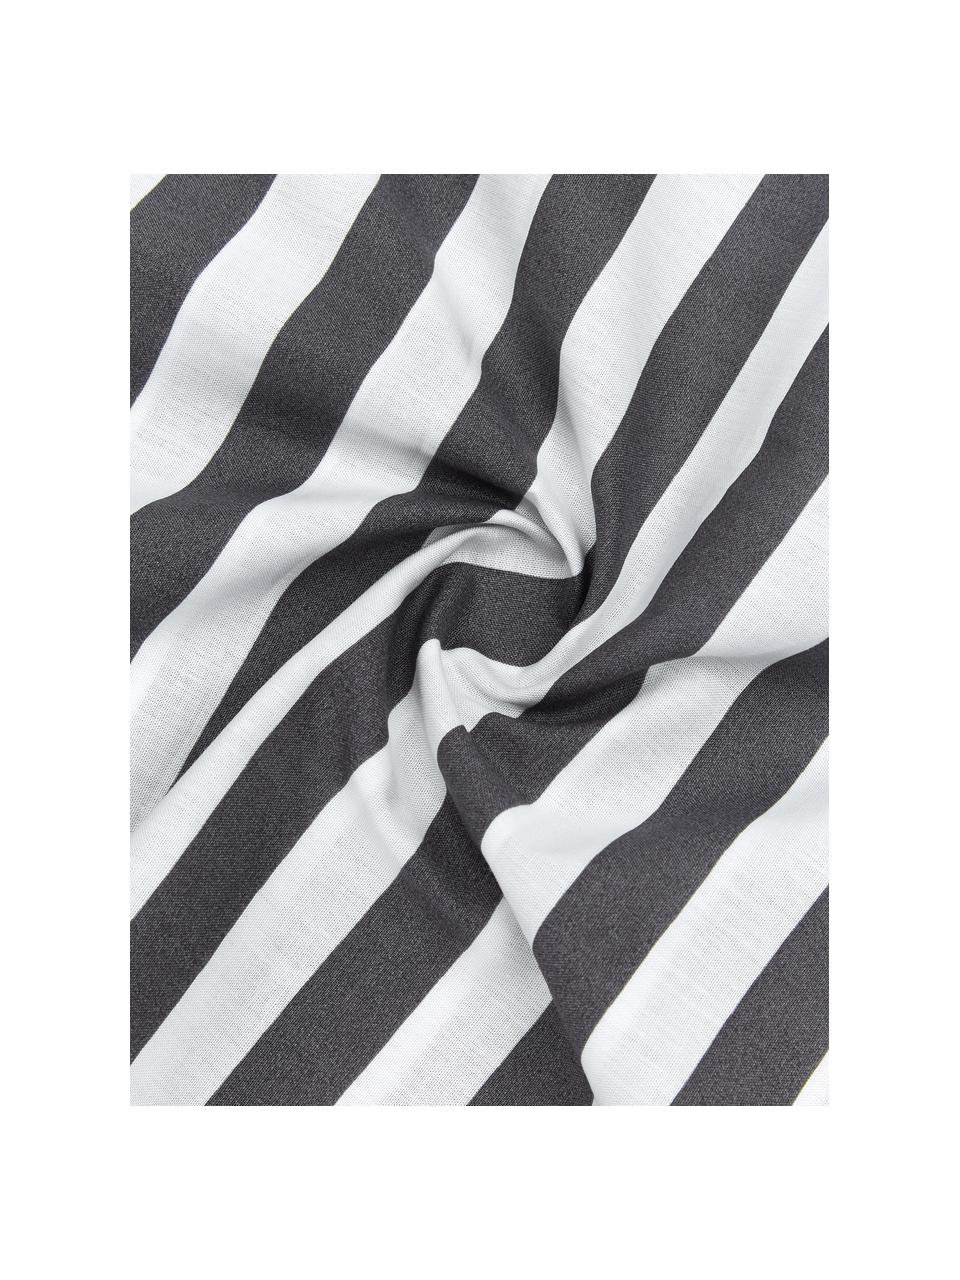 Gestreifte Baumwollperkal-Bettwäsche Yuliya in Dunkelgrau/Weiß, Webart: Perkal Fadendichte 180 TC, Dunkelgrau, Weiß, 240 x 220 cm + 2 Kissen 80 x 80 cm